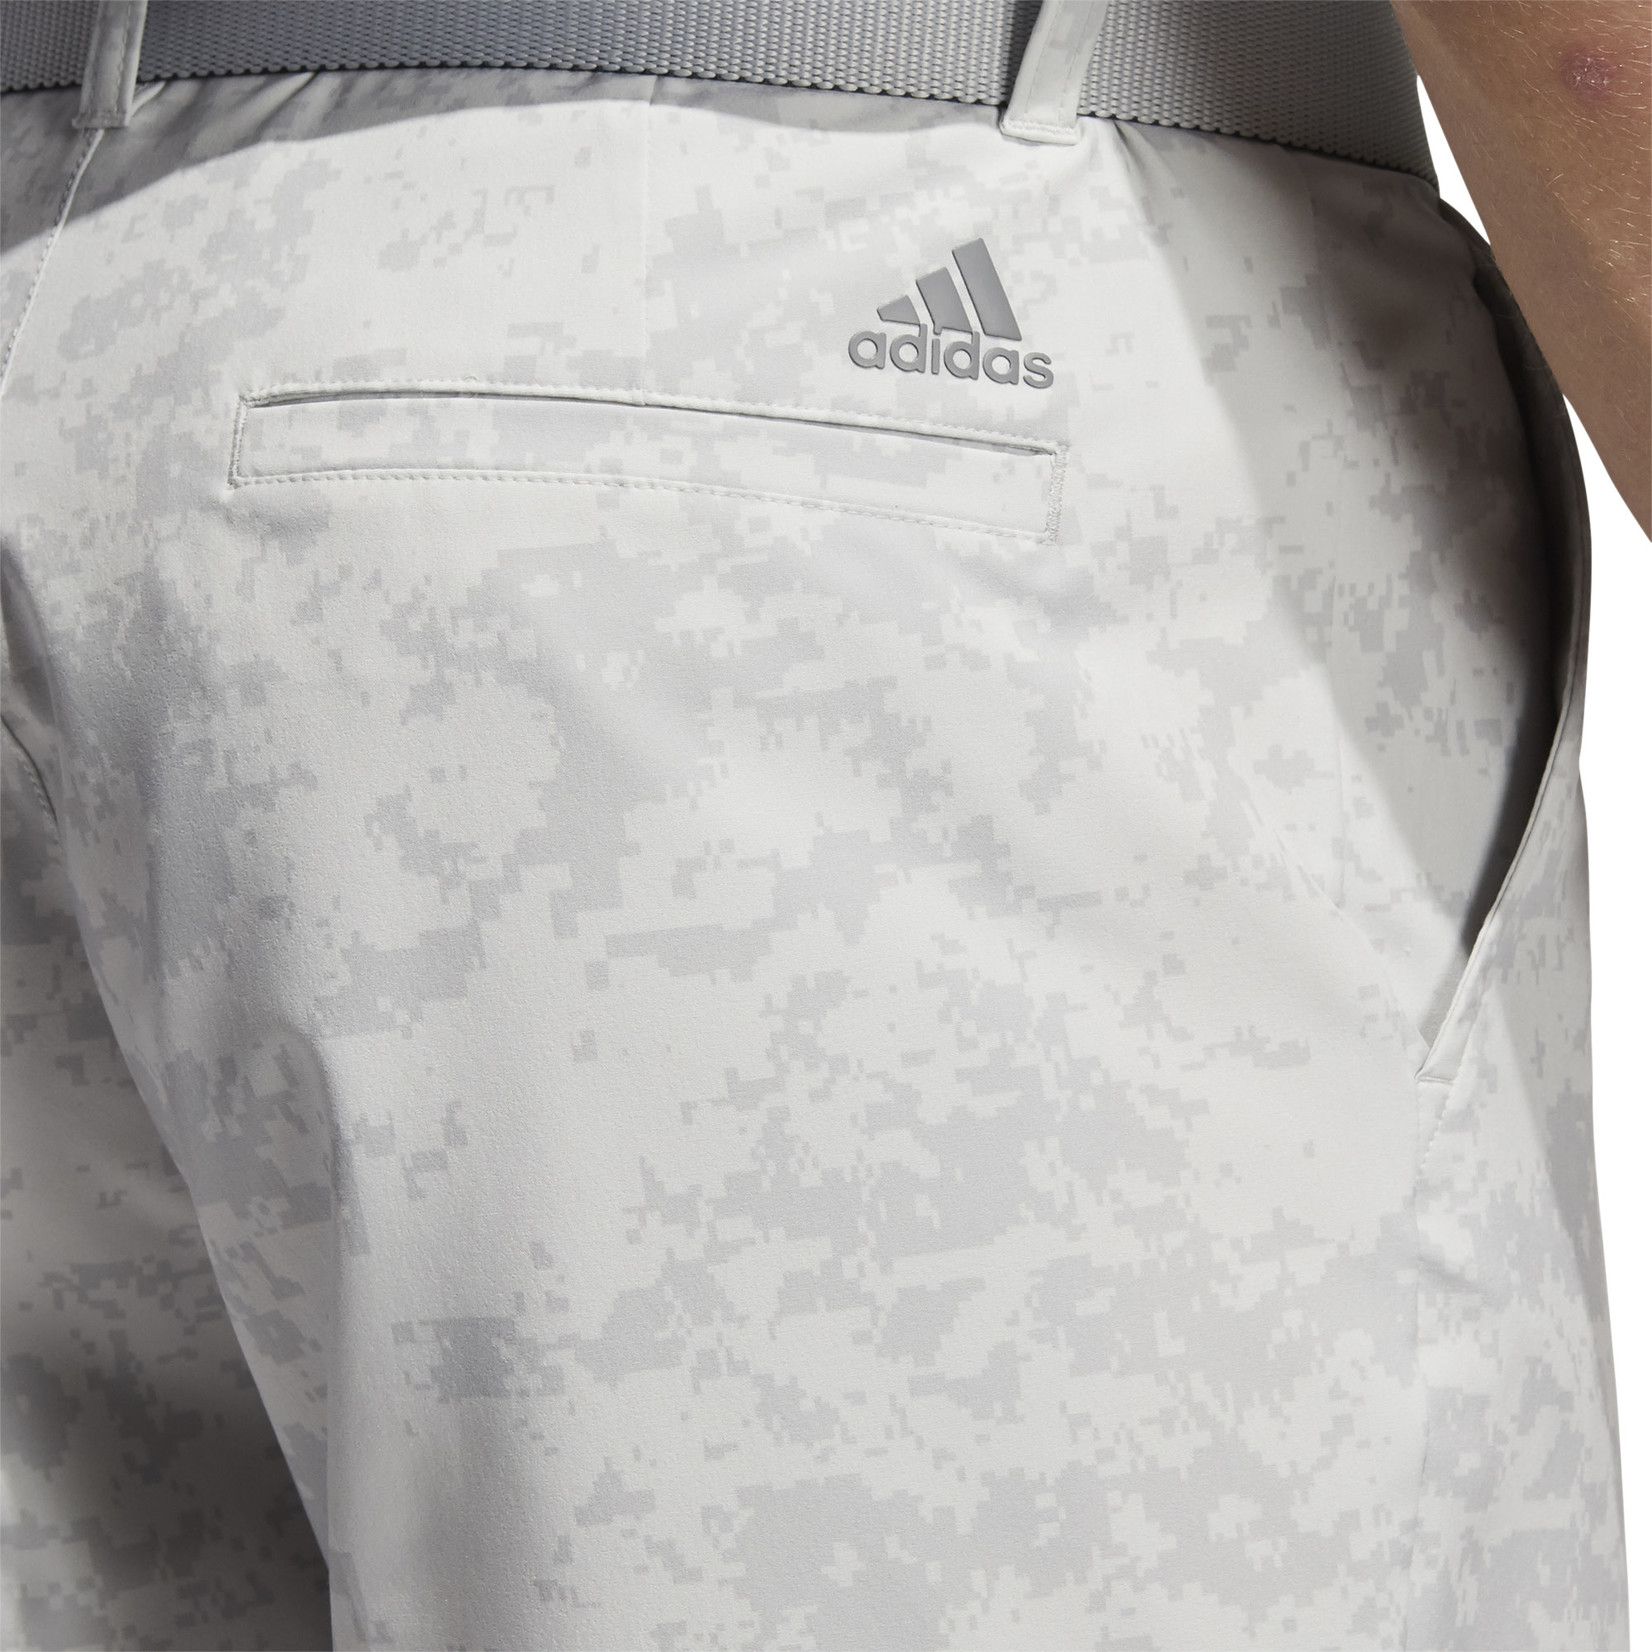 Adidas Adidas ULT365 Camo Short